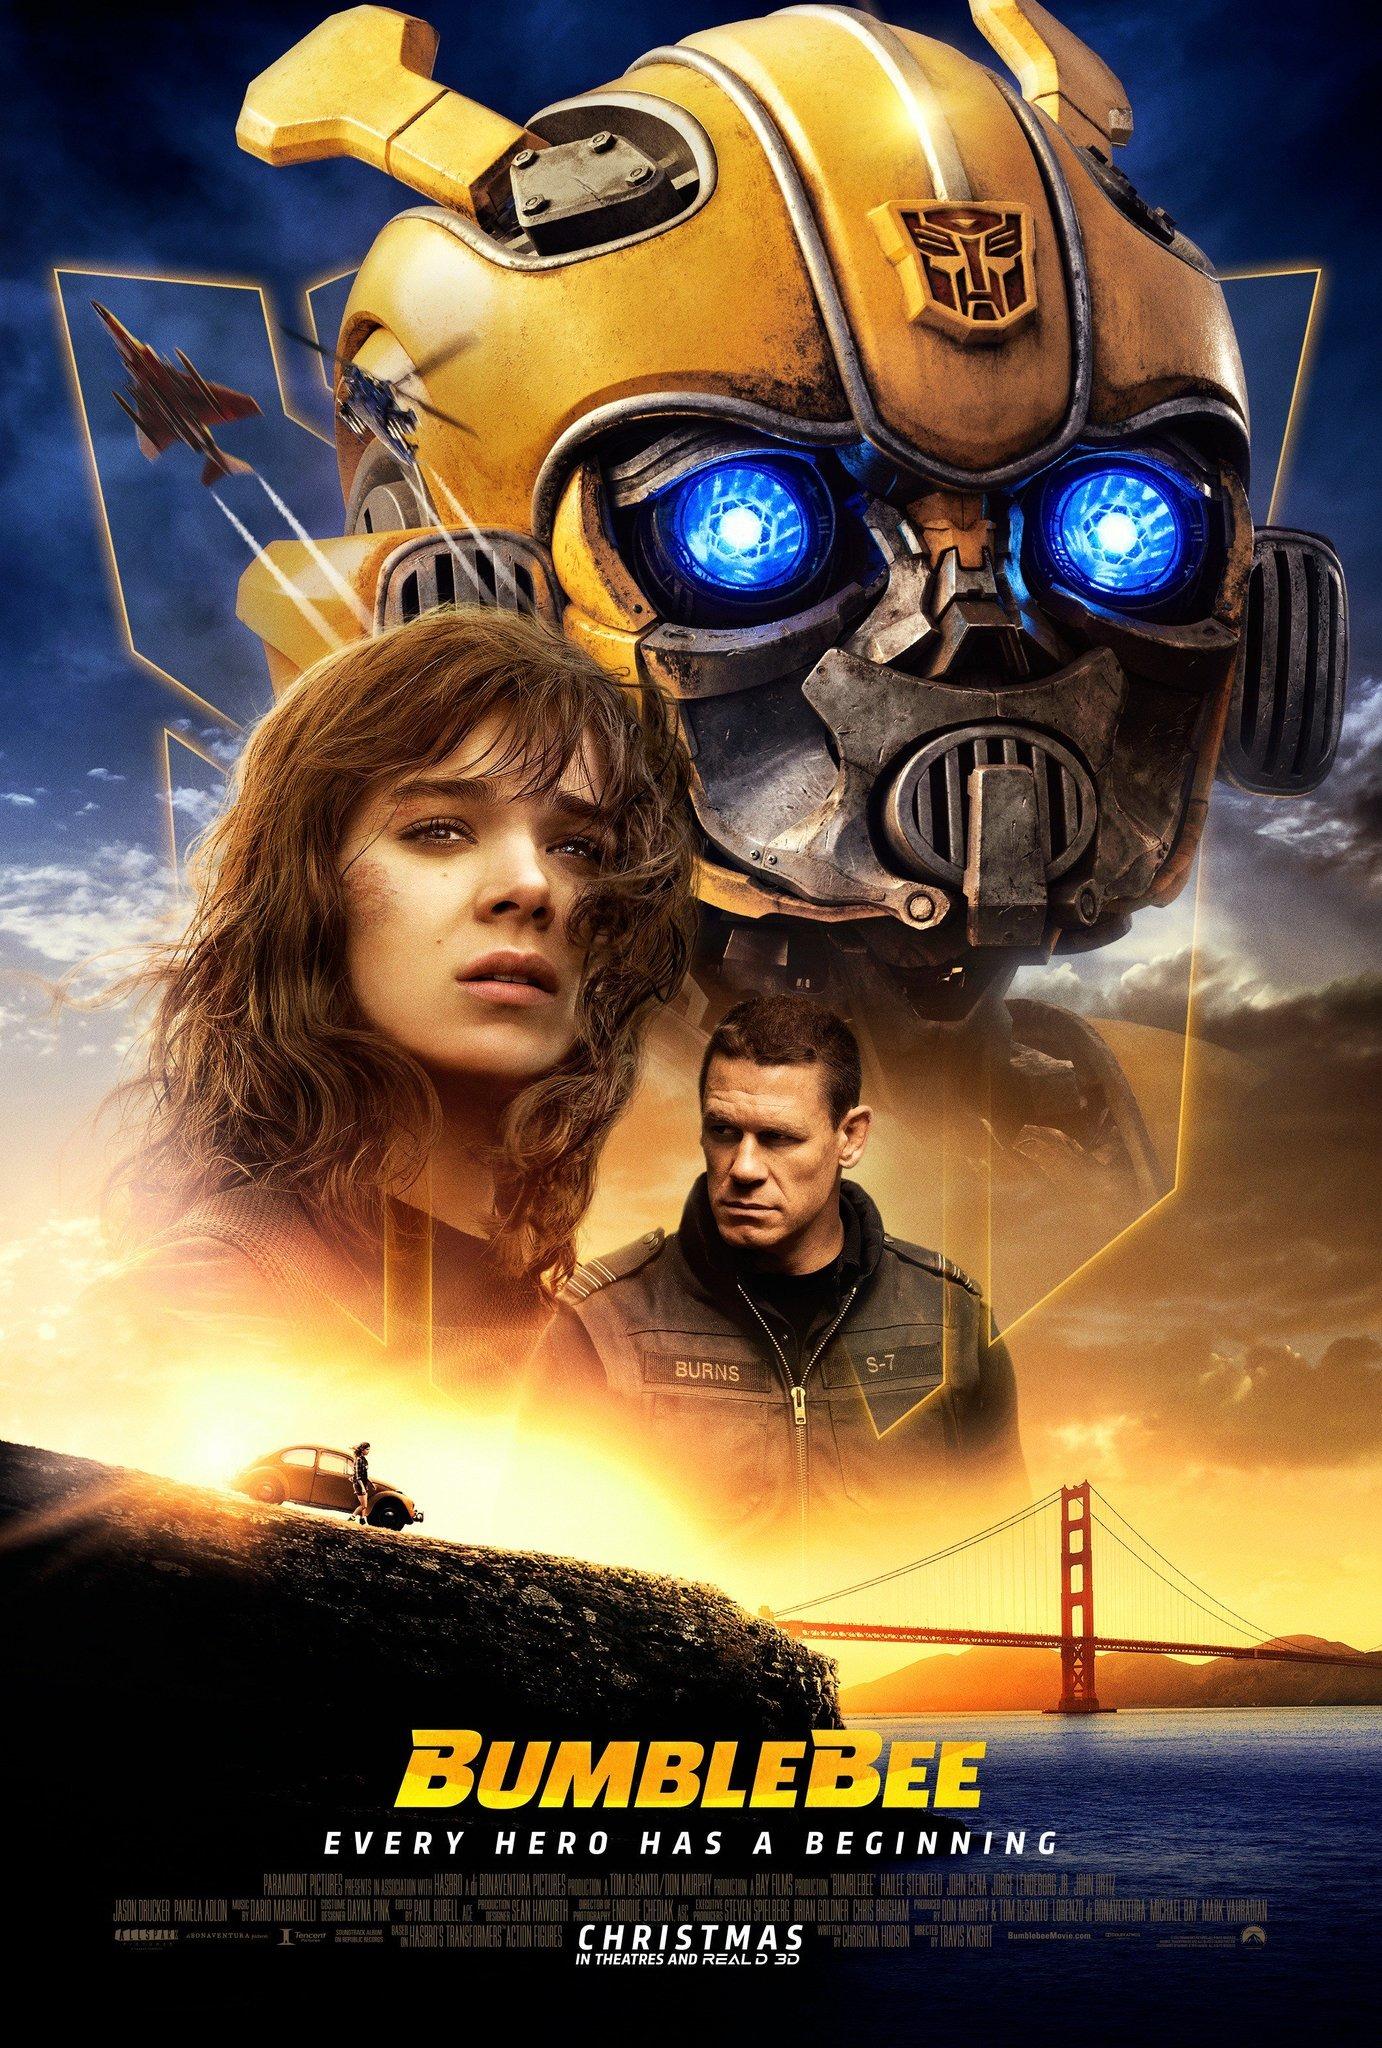 szmk_transformers_decepticon_autobot_bumblebee_urdongo_optimus_prime_8.jpg